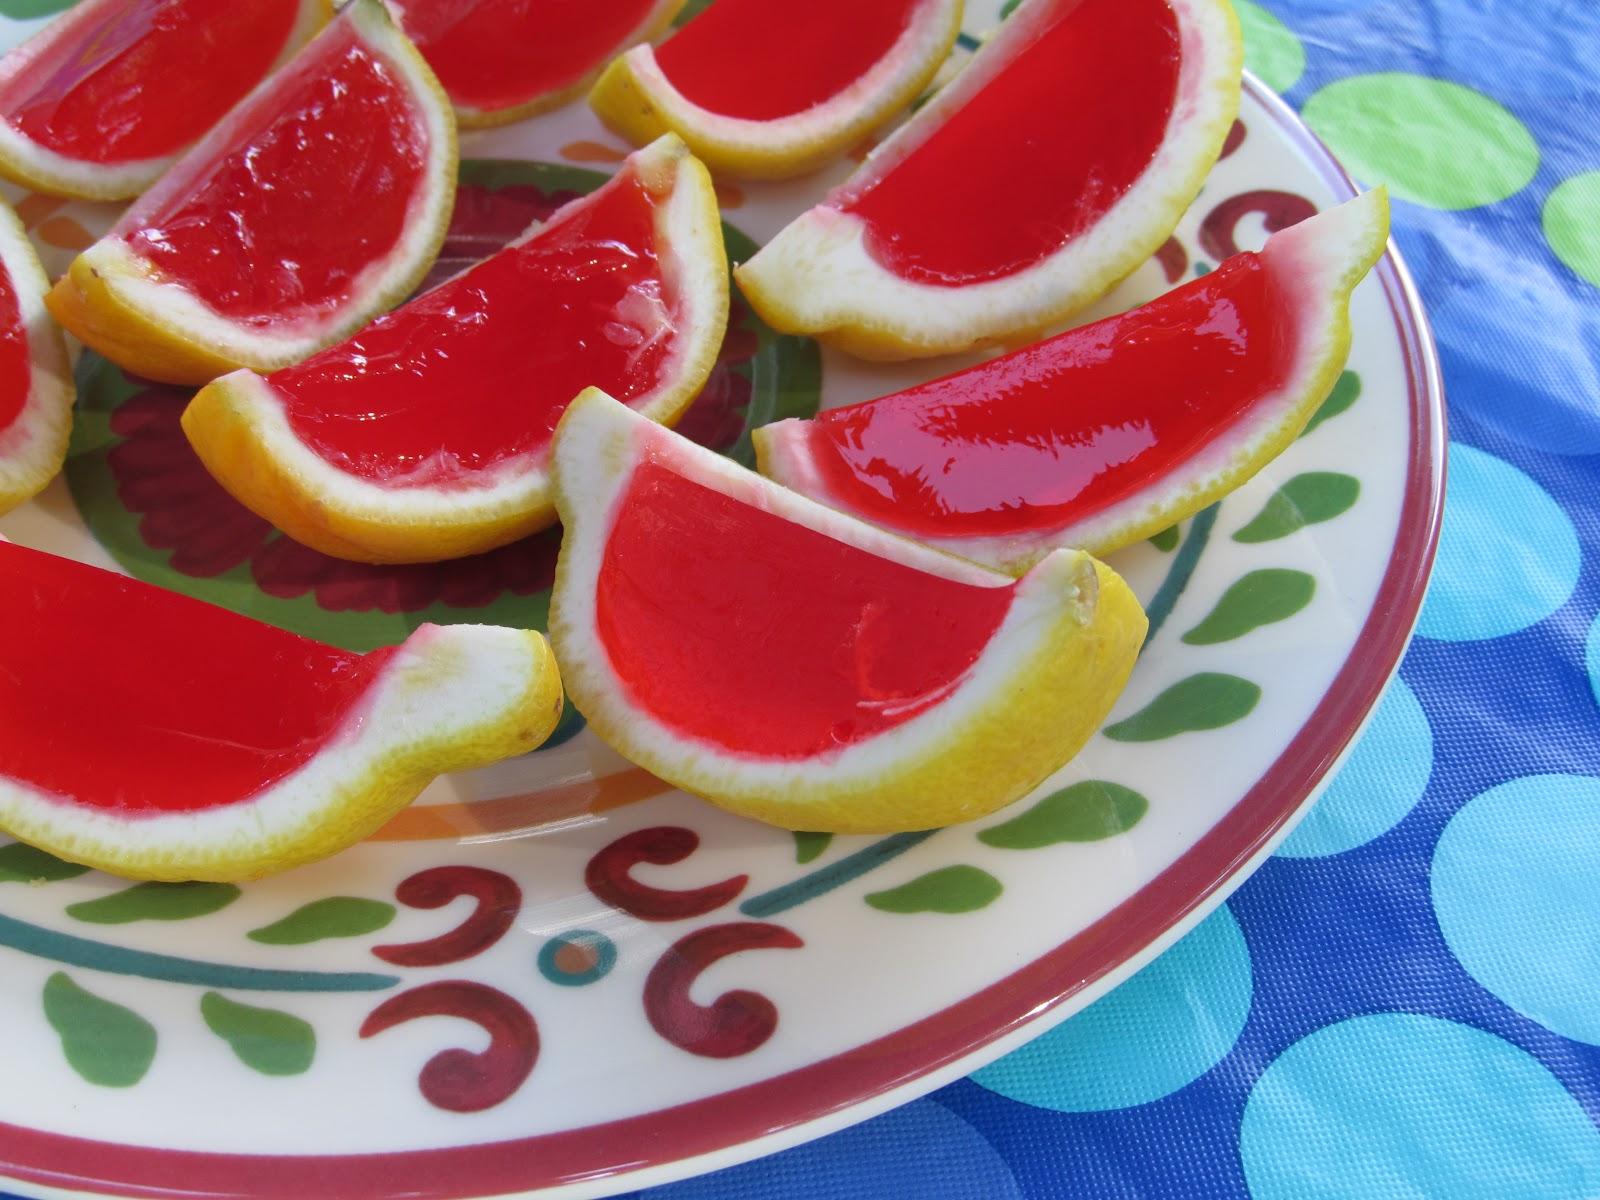 Slimmerpickings: Strawberry-Lemonade Jello Shots